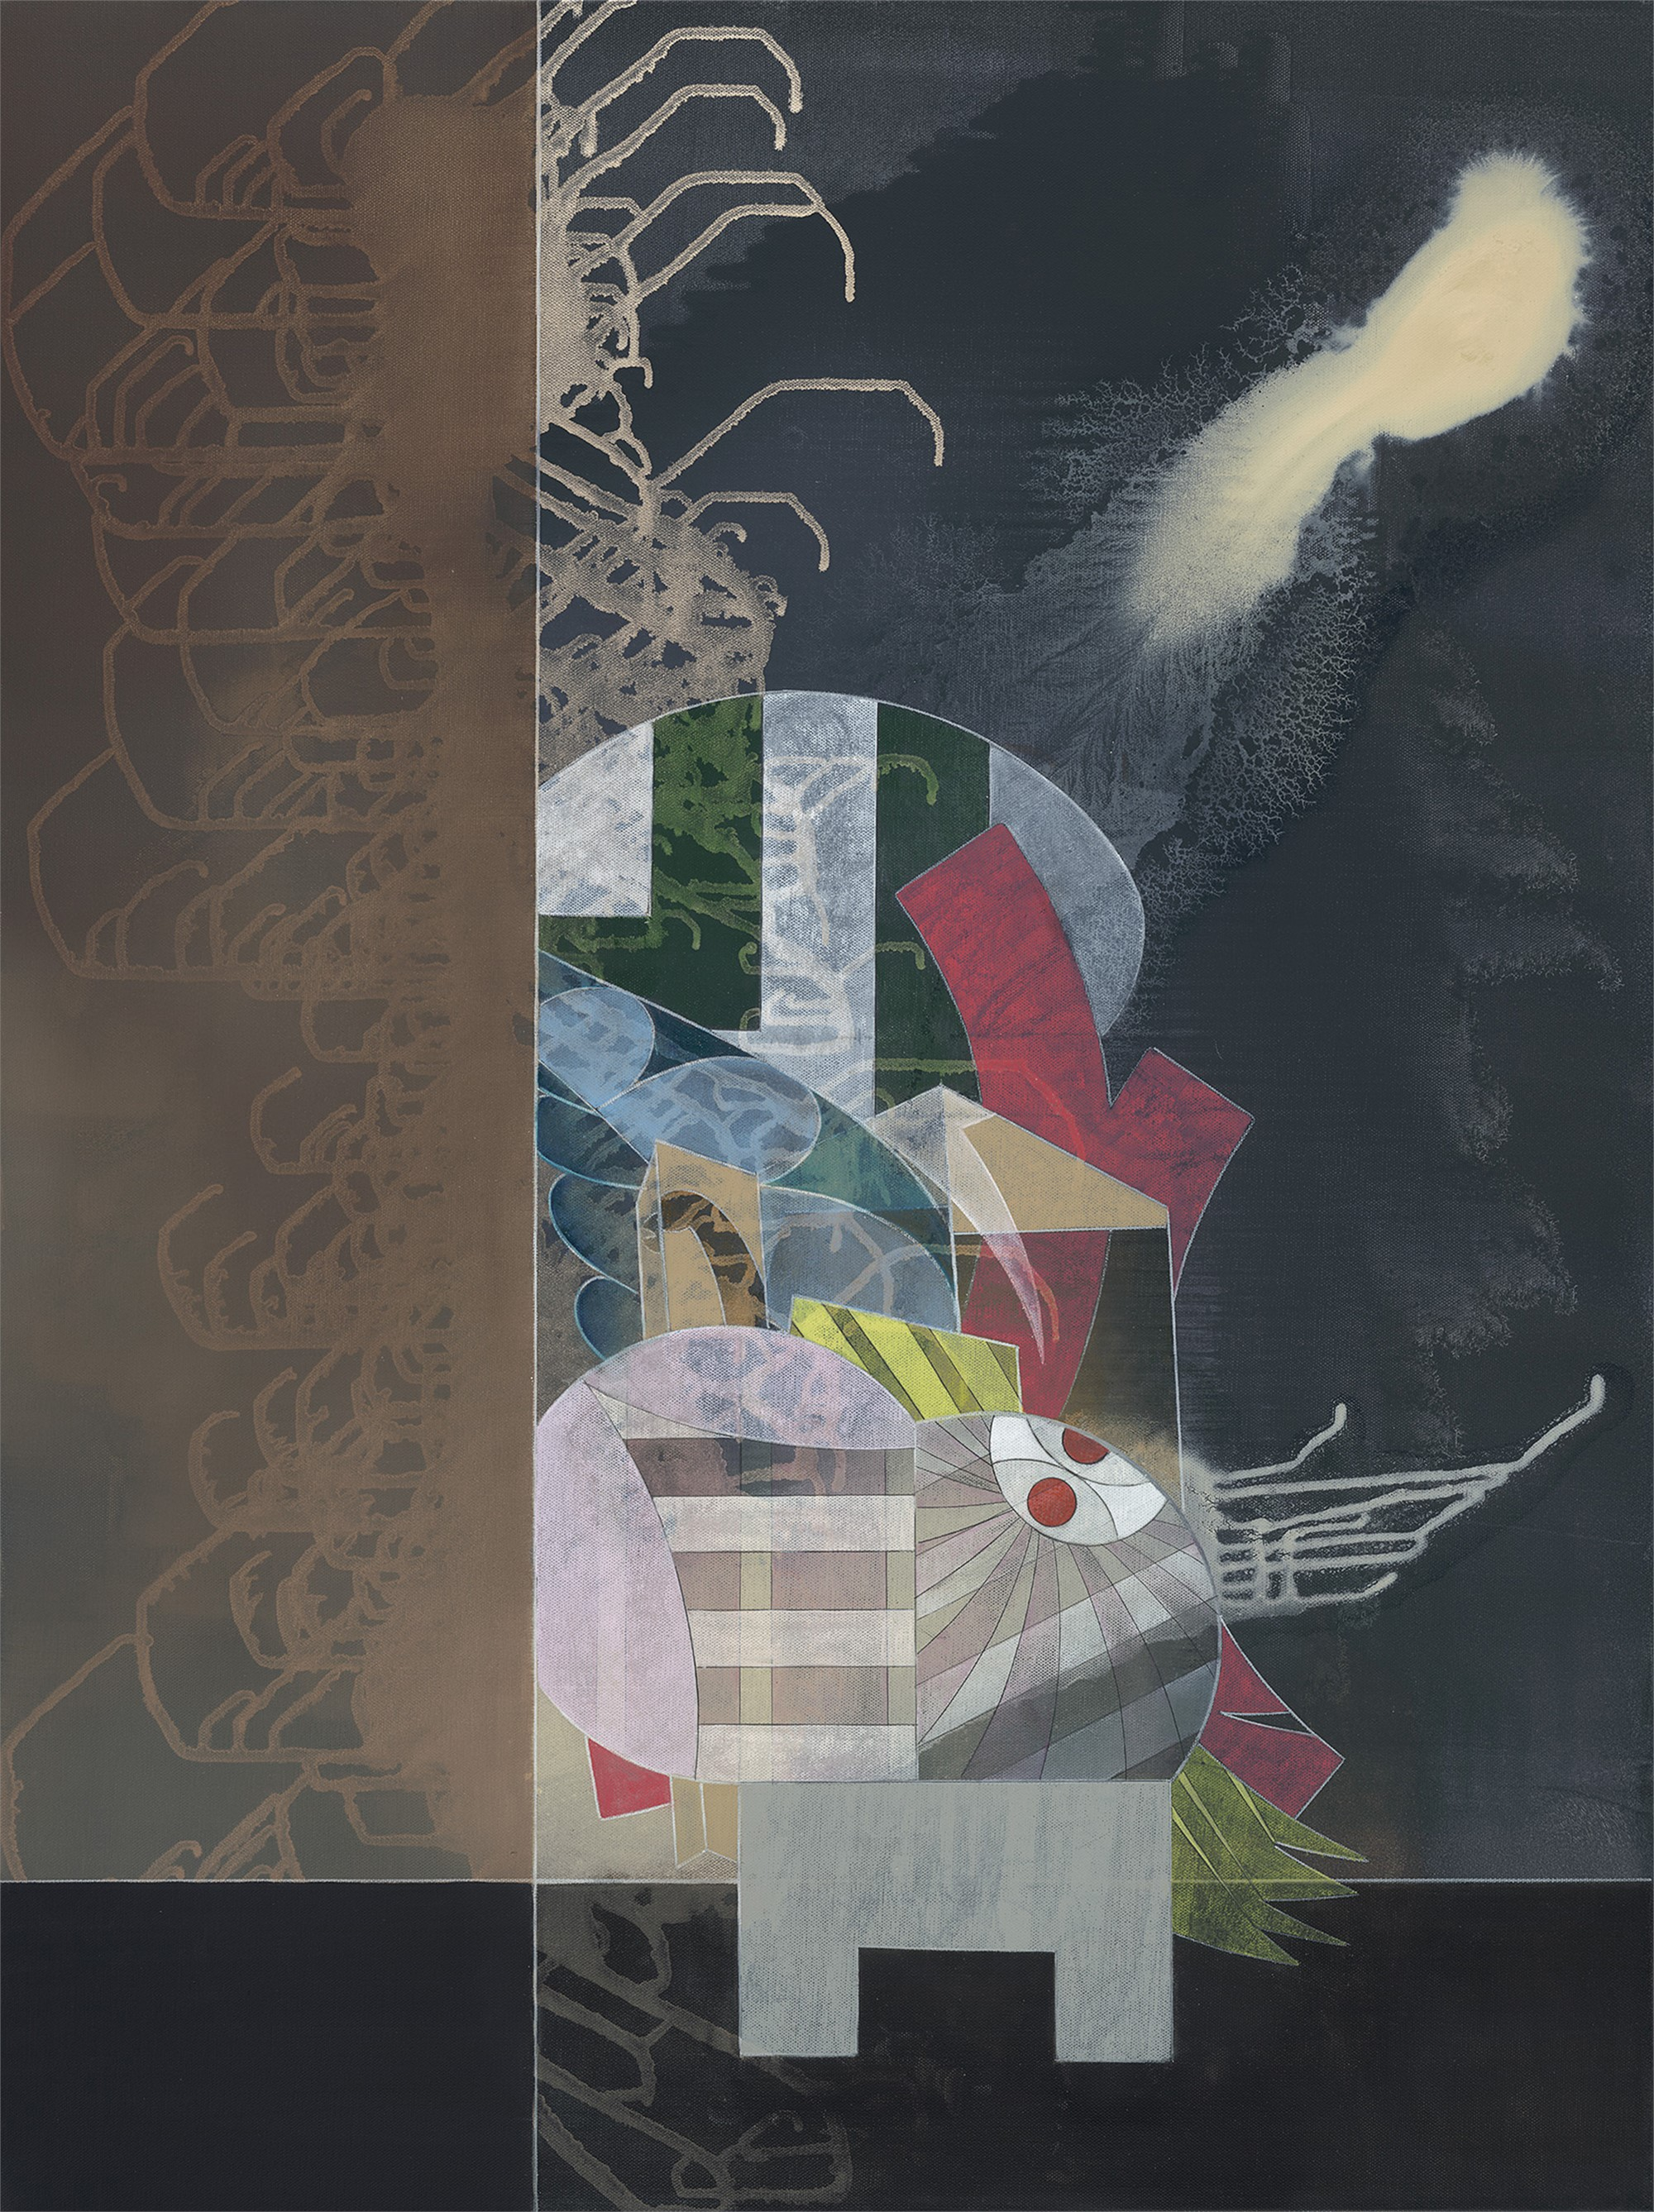 Langula by Kuzana Ogg